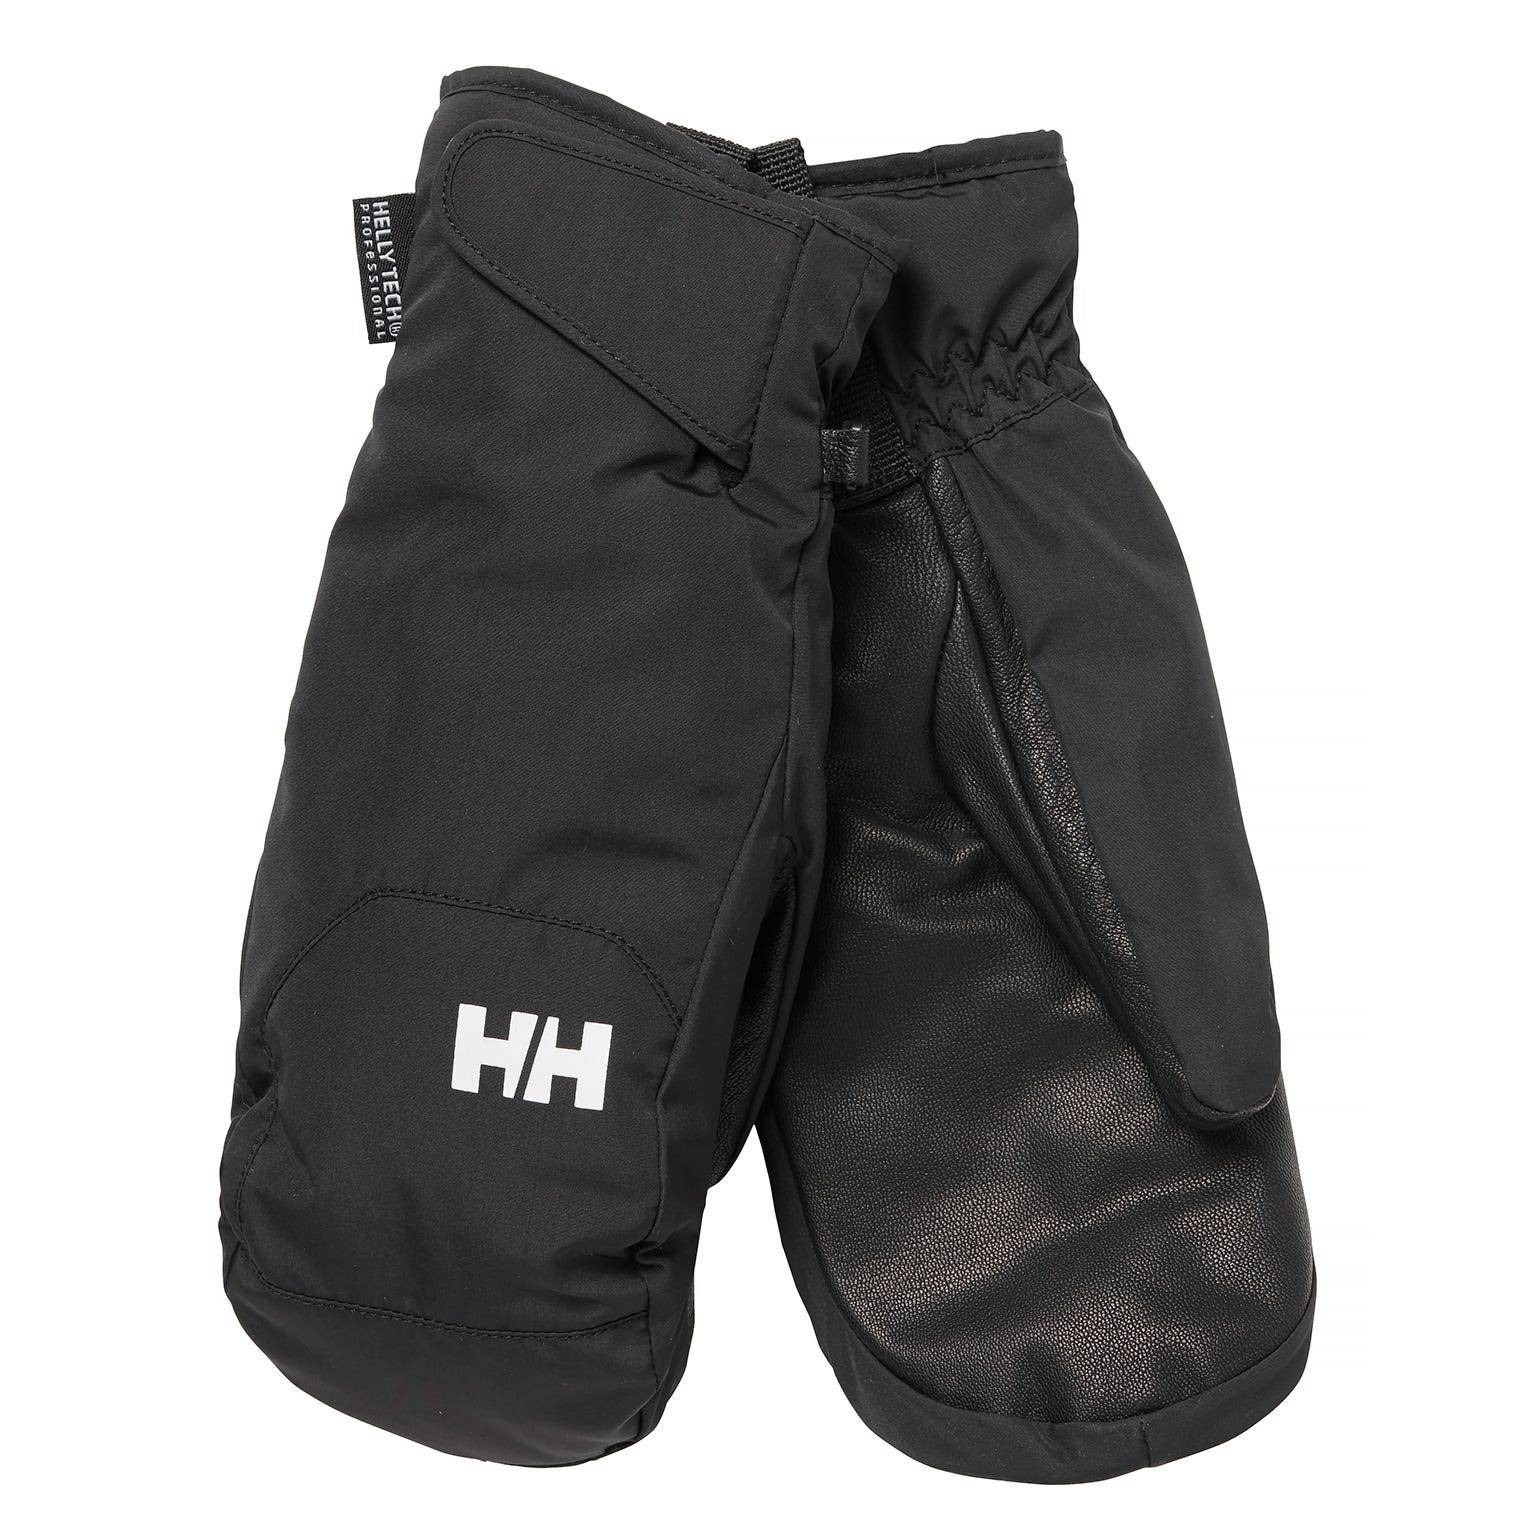 Helly Hansen Swift Ht Mittens Mens Black M